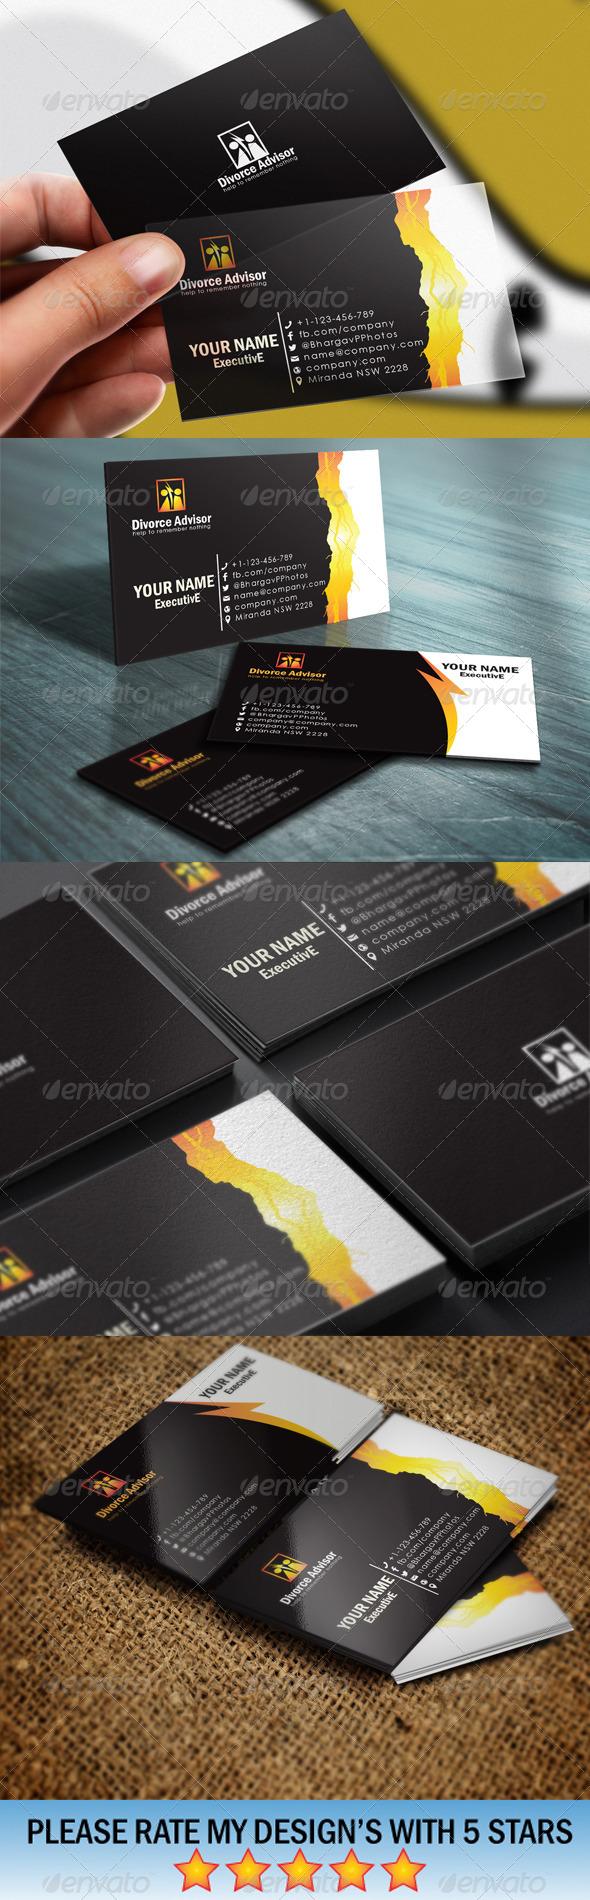 GraphicRiver Divorce Advisory Business Card Templates 5487258